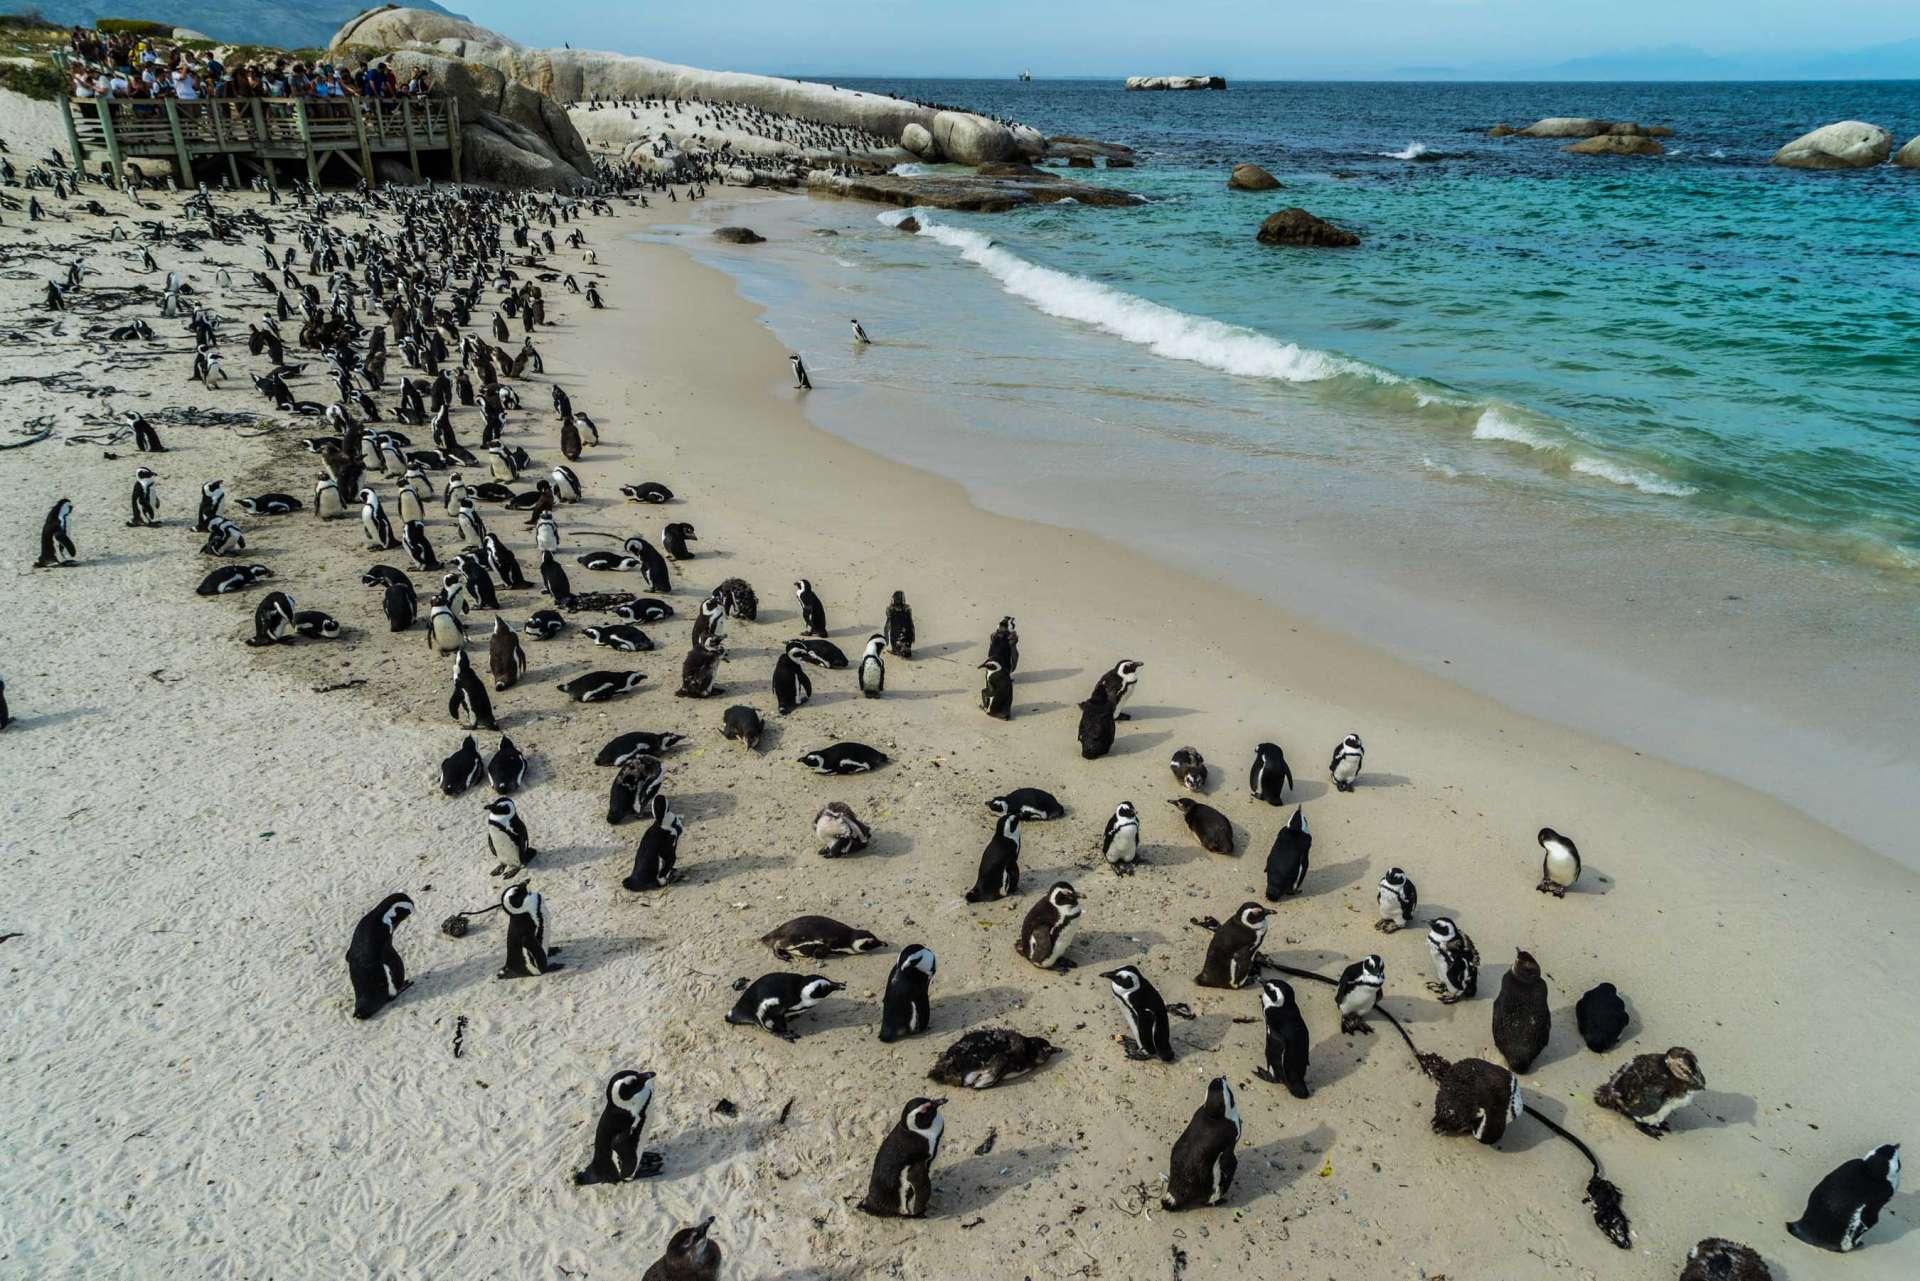 Cape Town Boulders Beach Pescart Enrico Pescantini 6